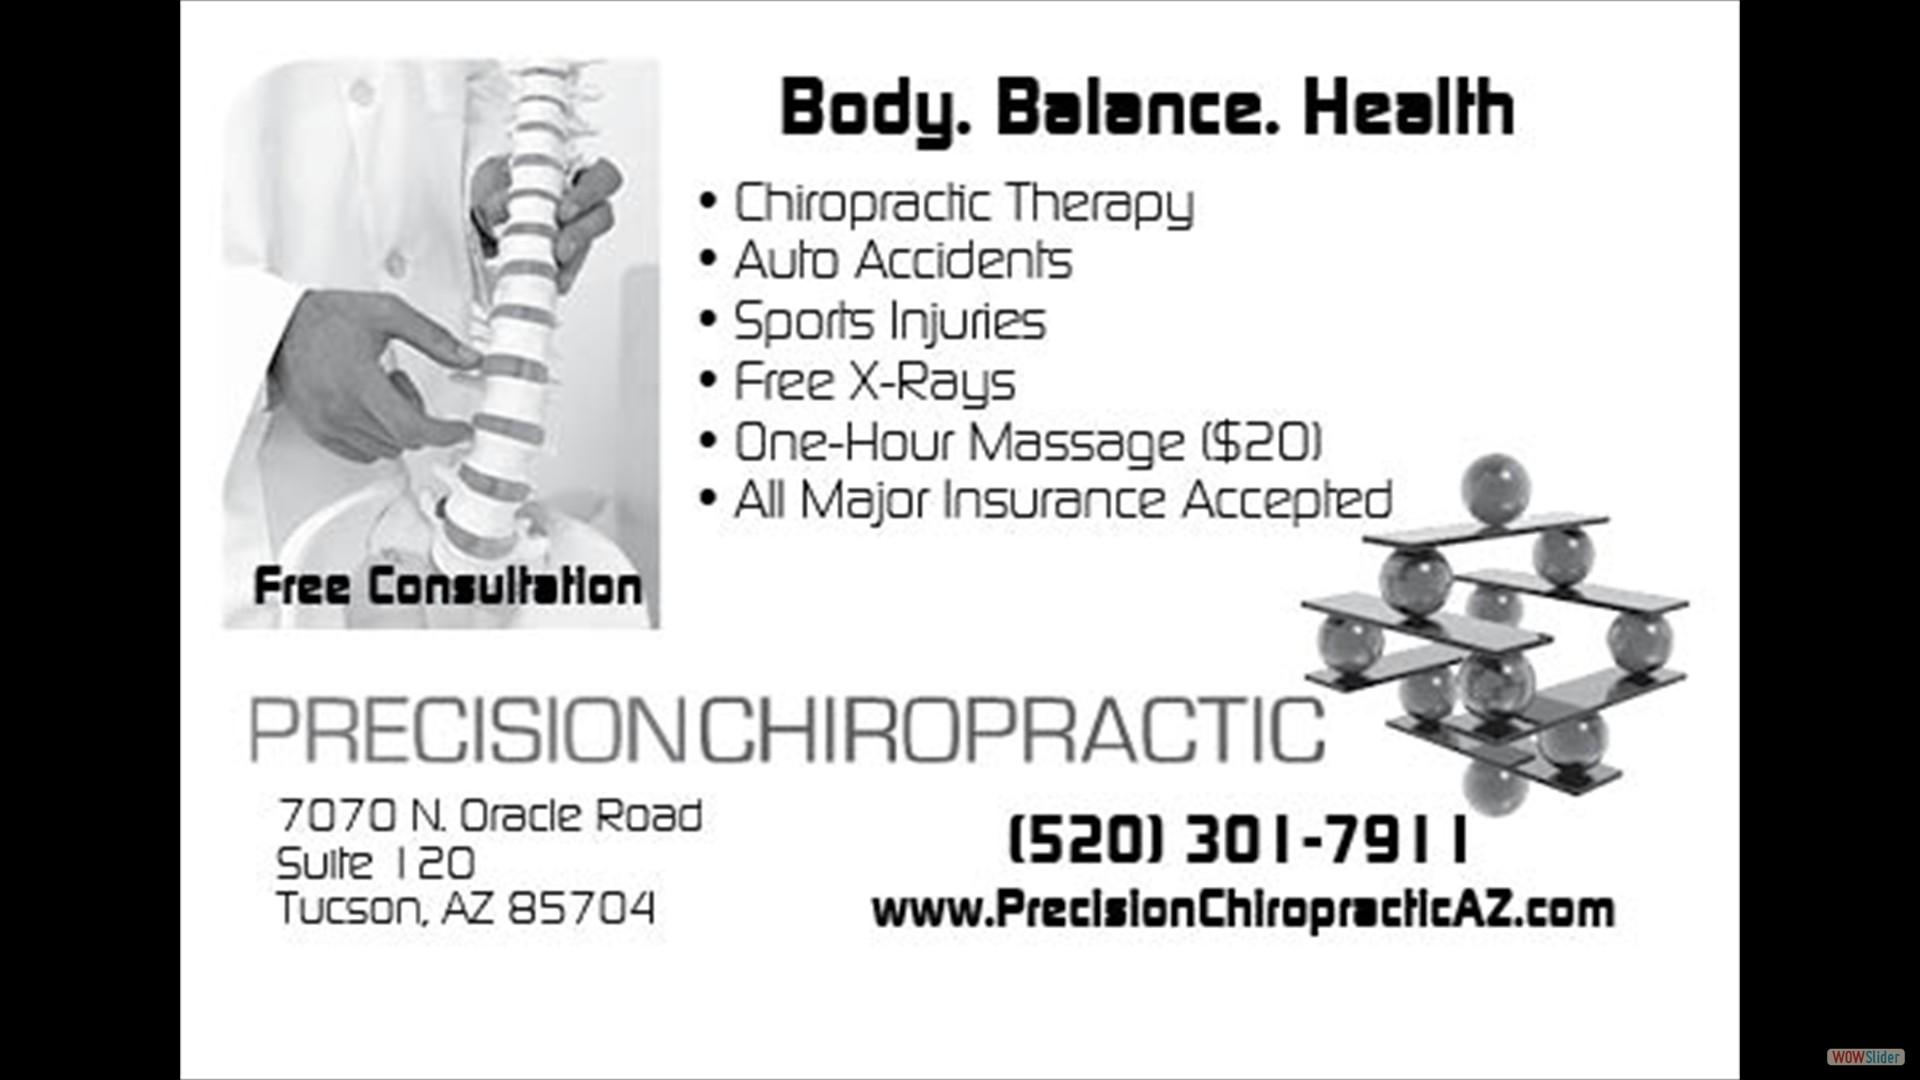 Precision Chiropractic top borderless